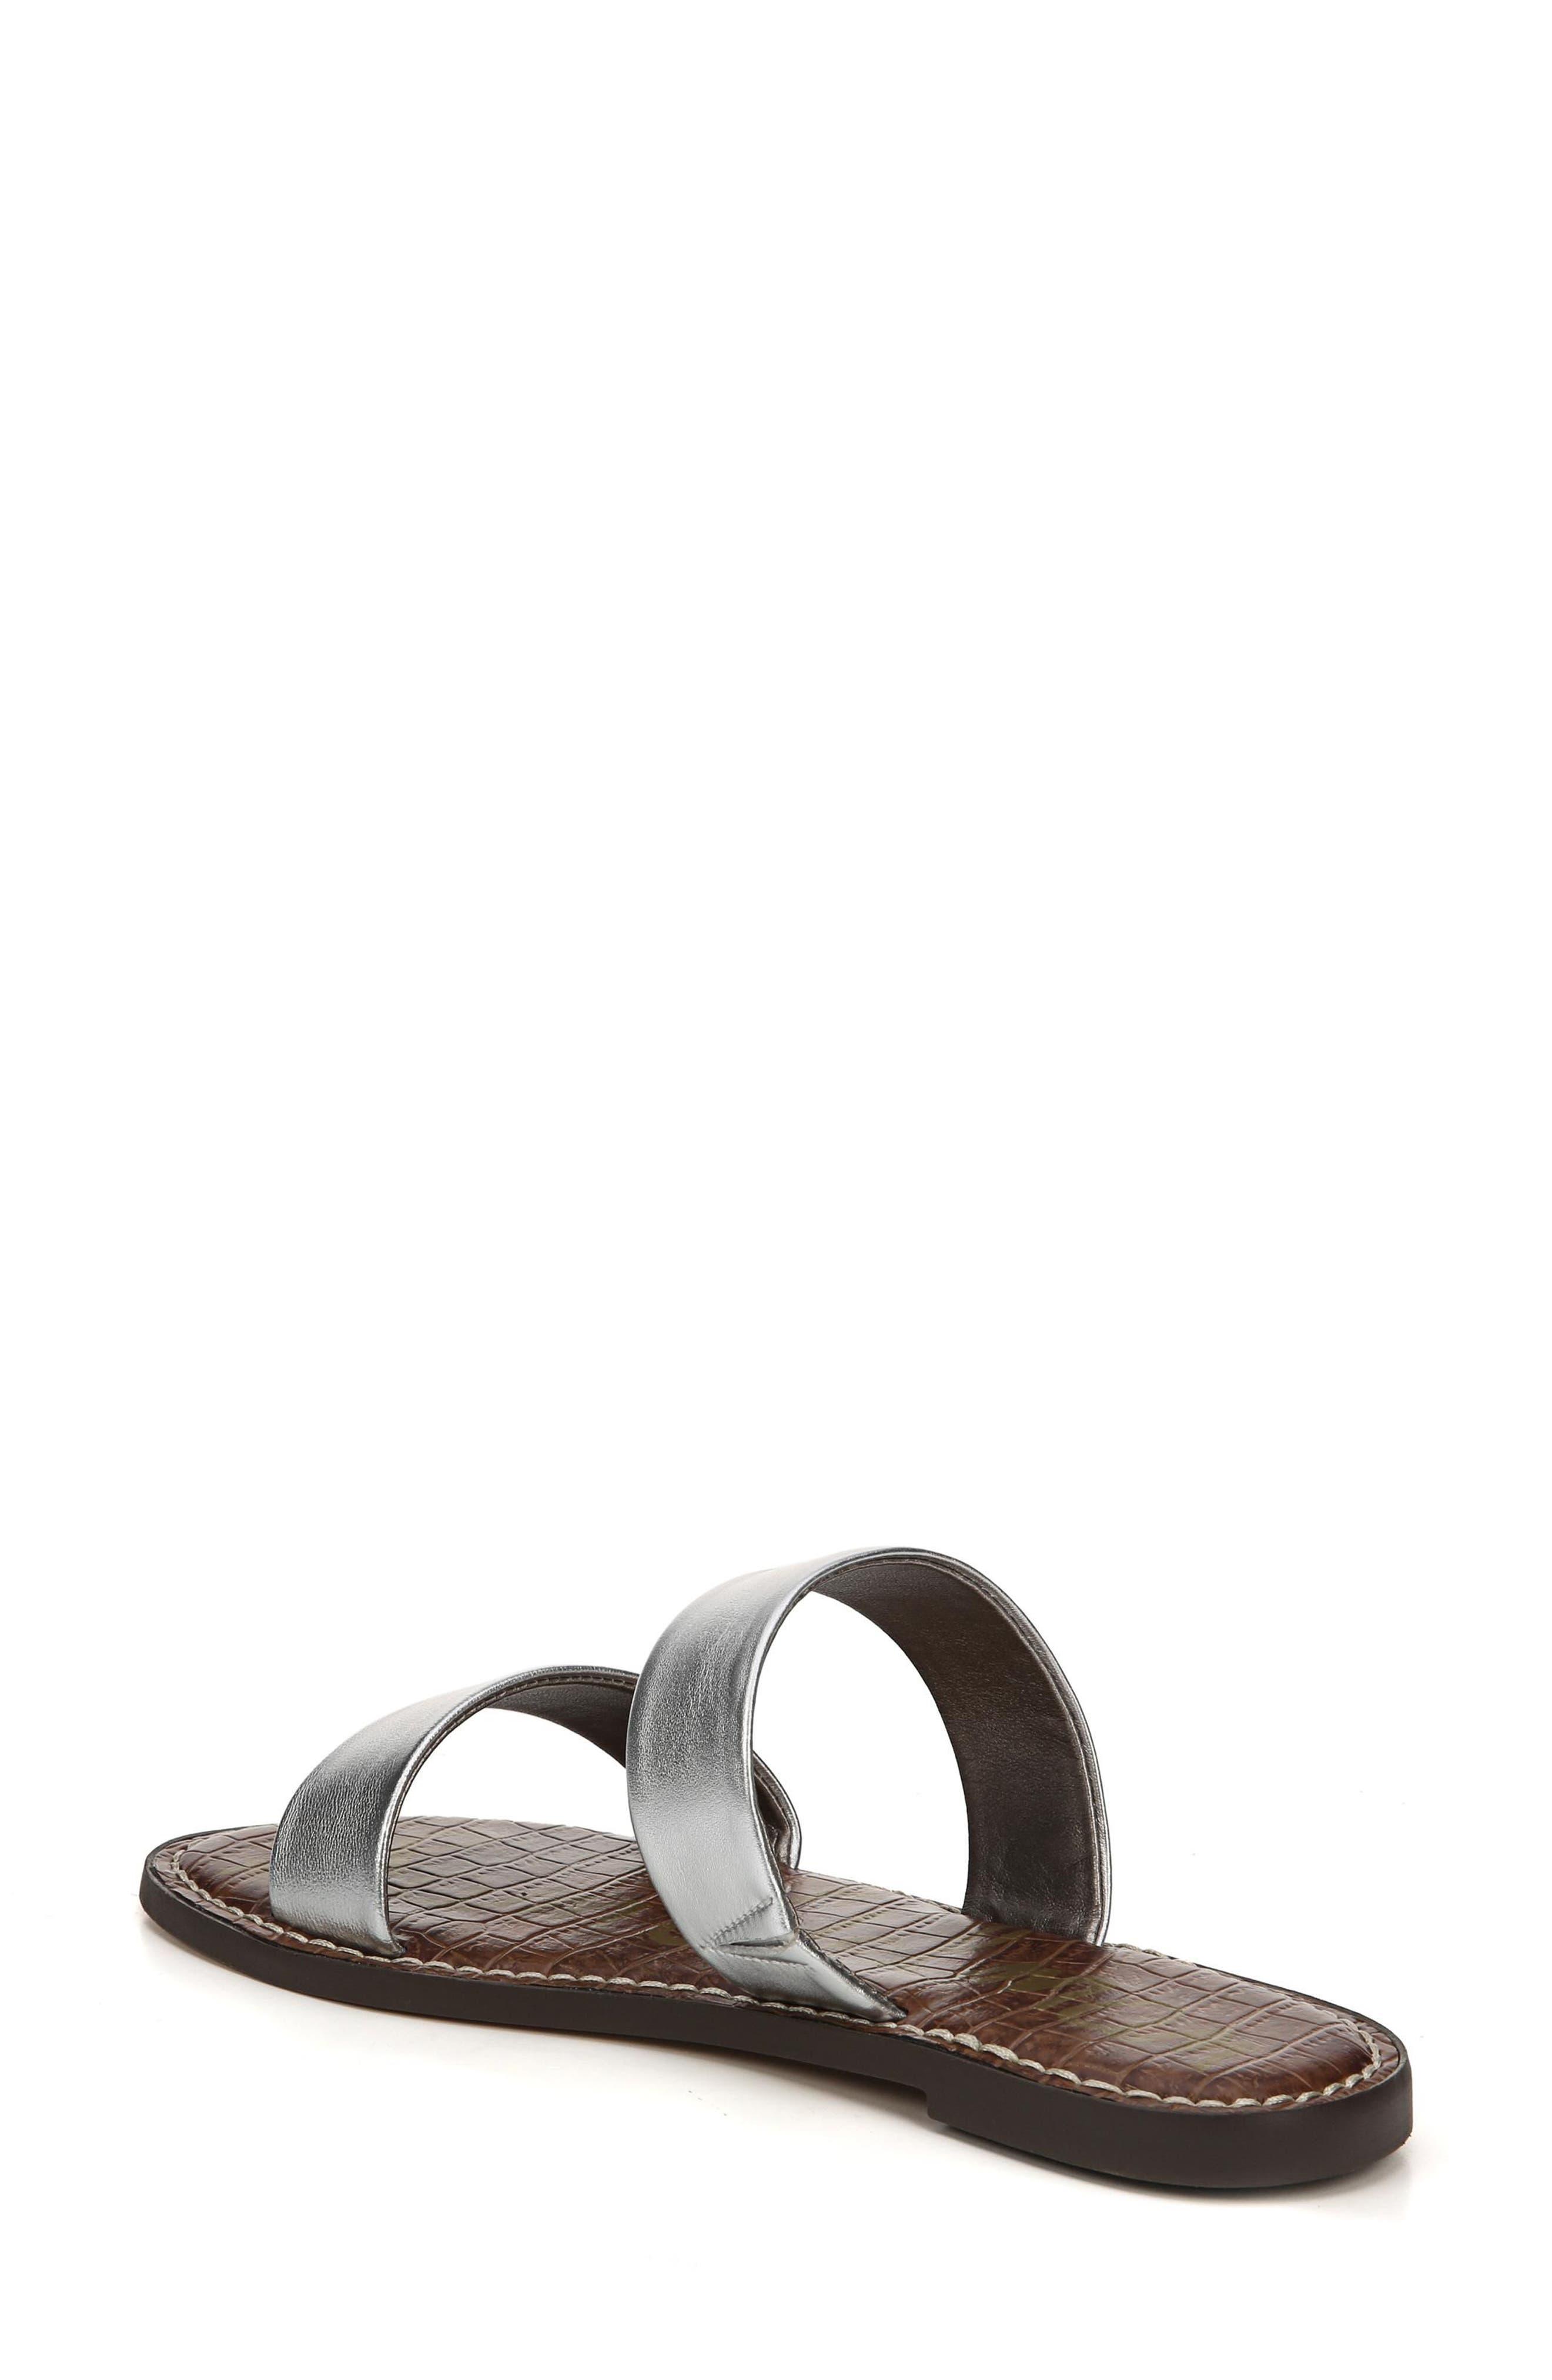 Gala Two Strap Slide Sandal,                             Alternate thumbnail 2, color,                             Silver Leather